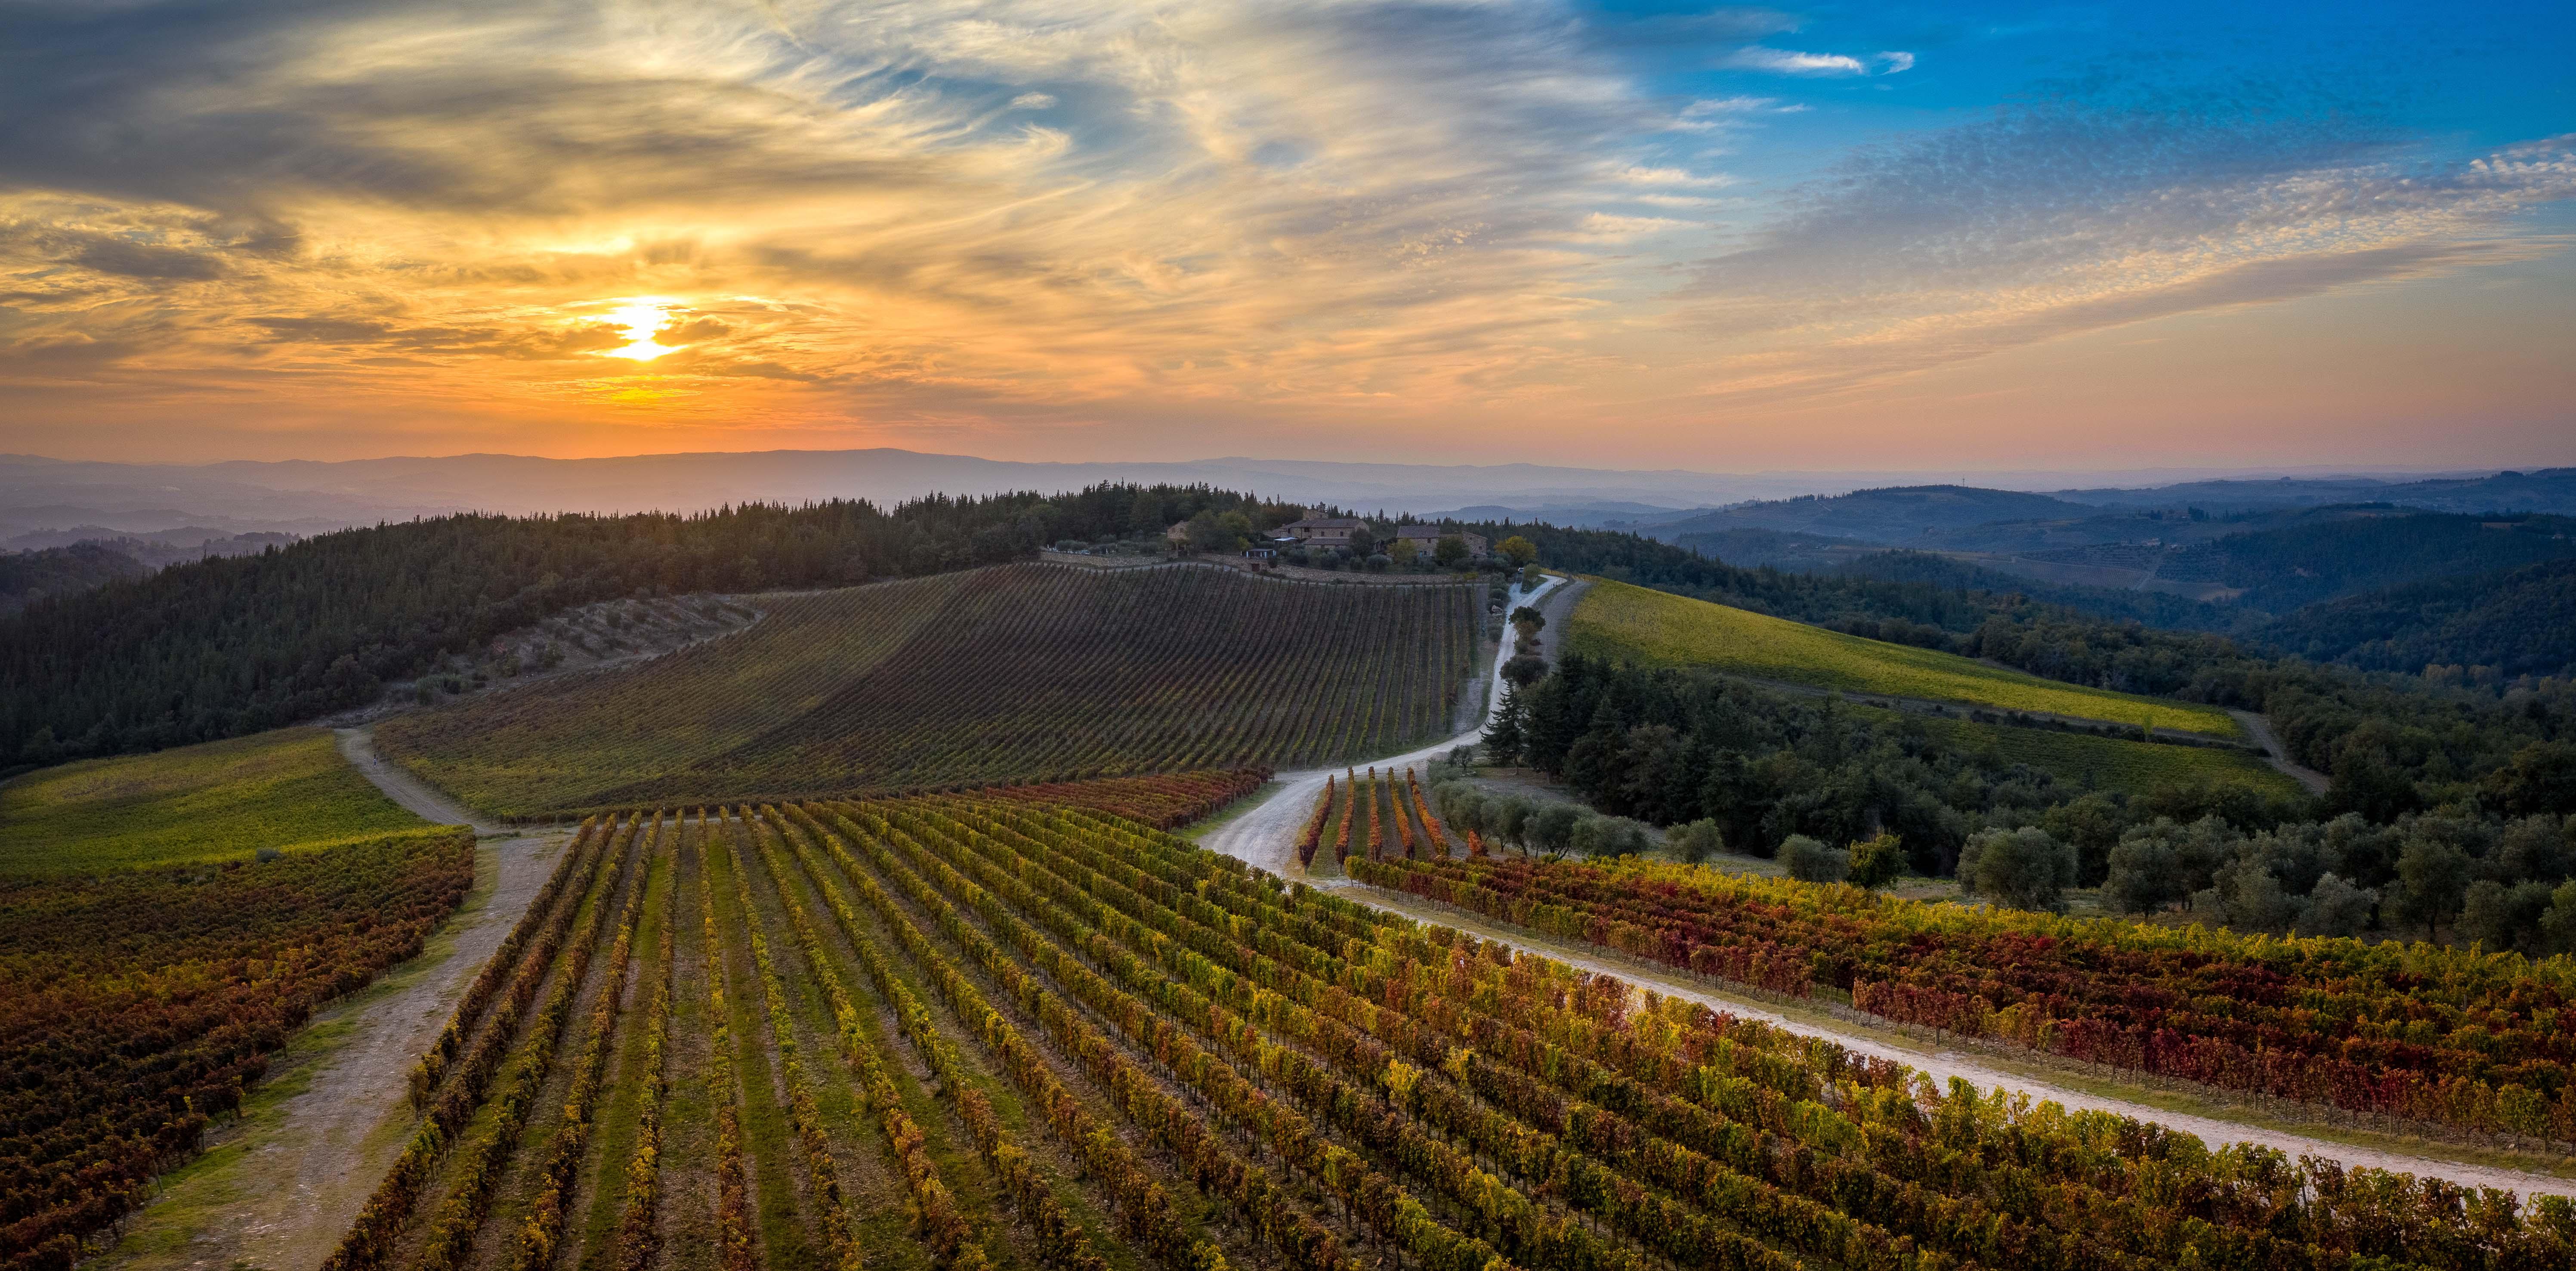 Tuscany-1.jpg